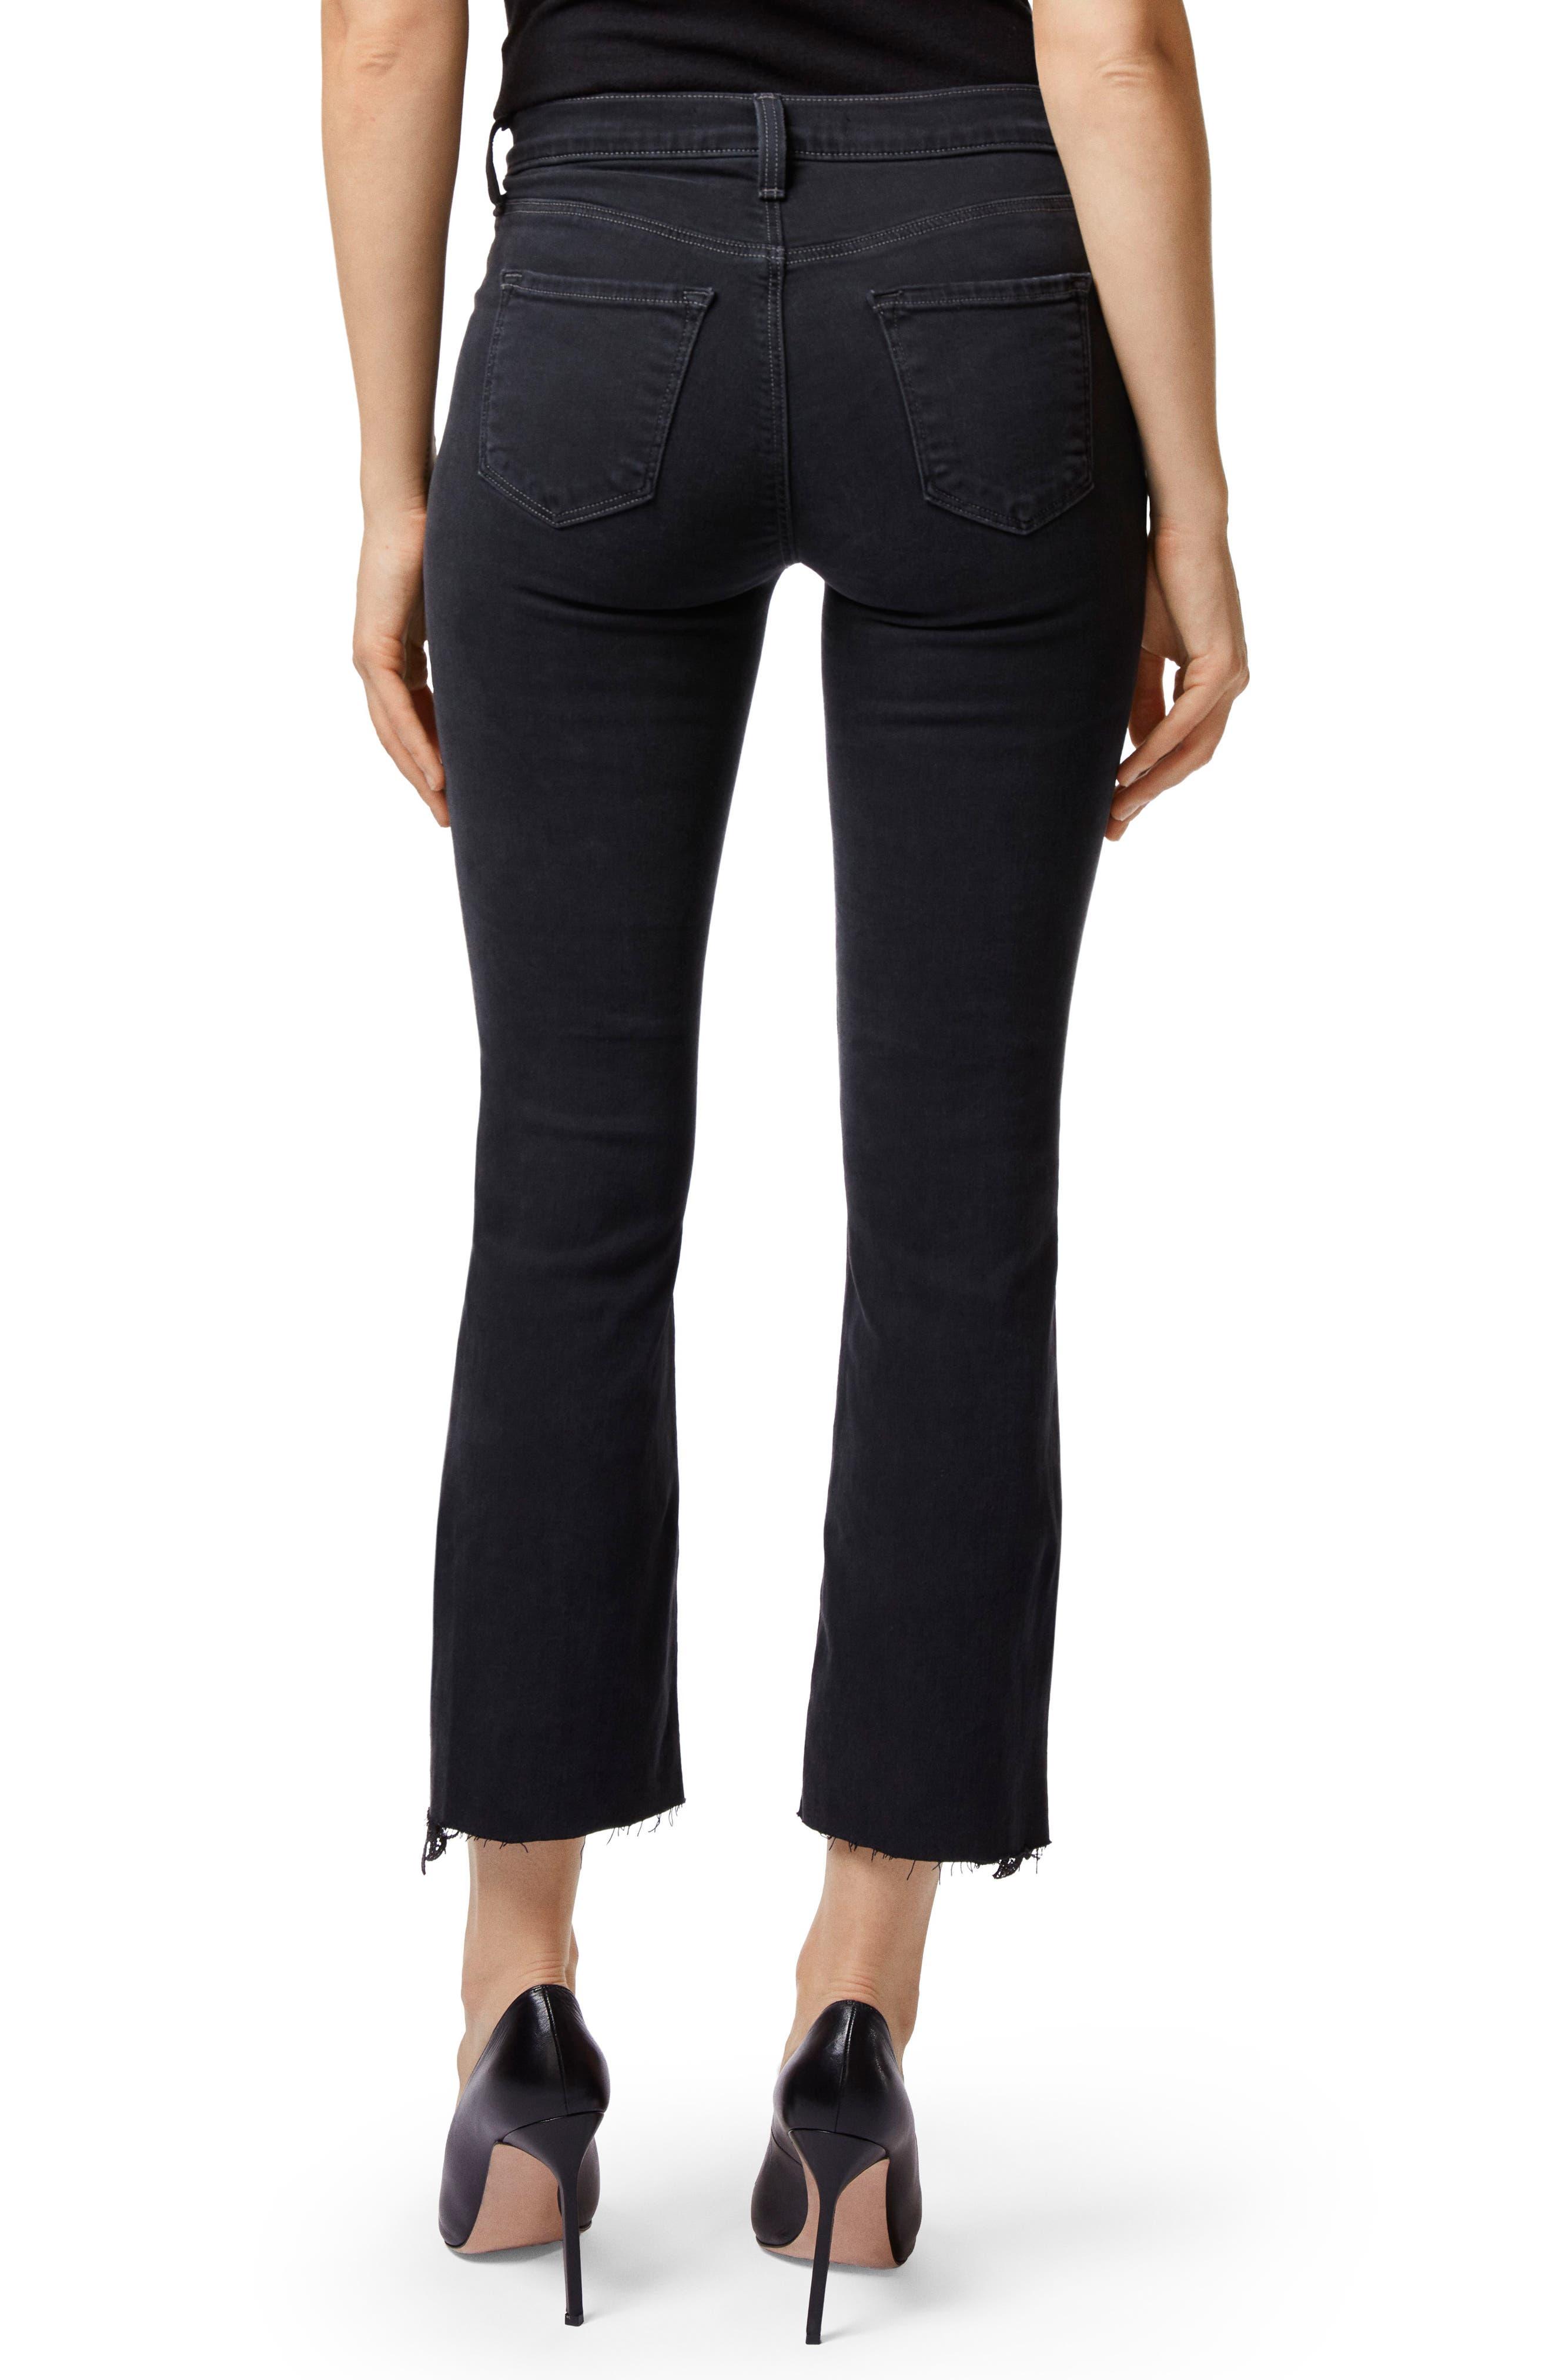 J BRAND,                             Selena Crop Bootcut Jeans,                             Alternate thumbnail 2, color,                             001